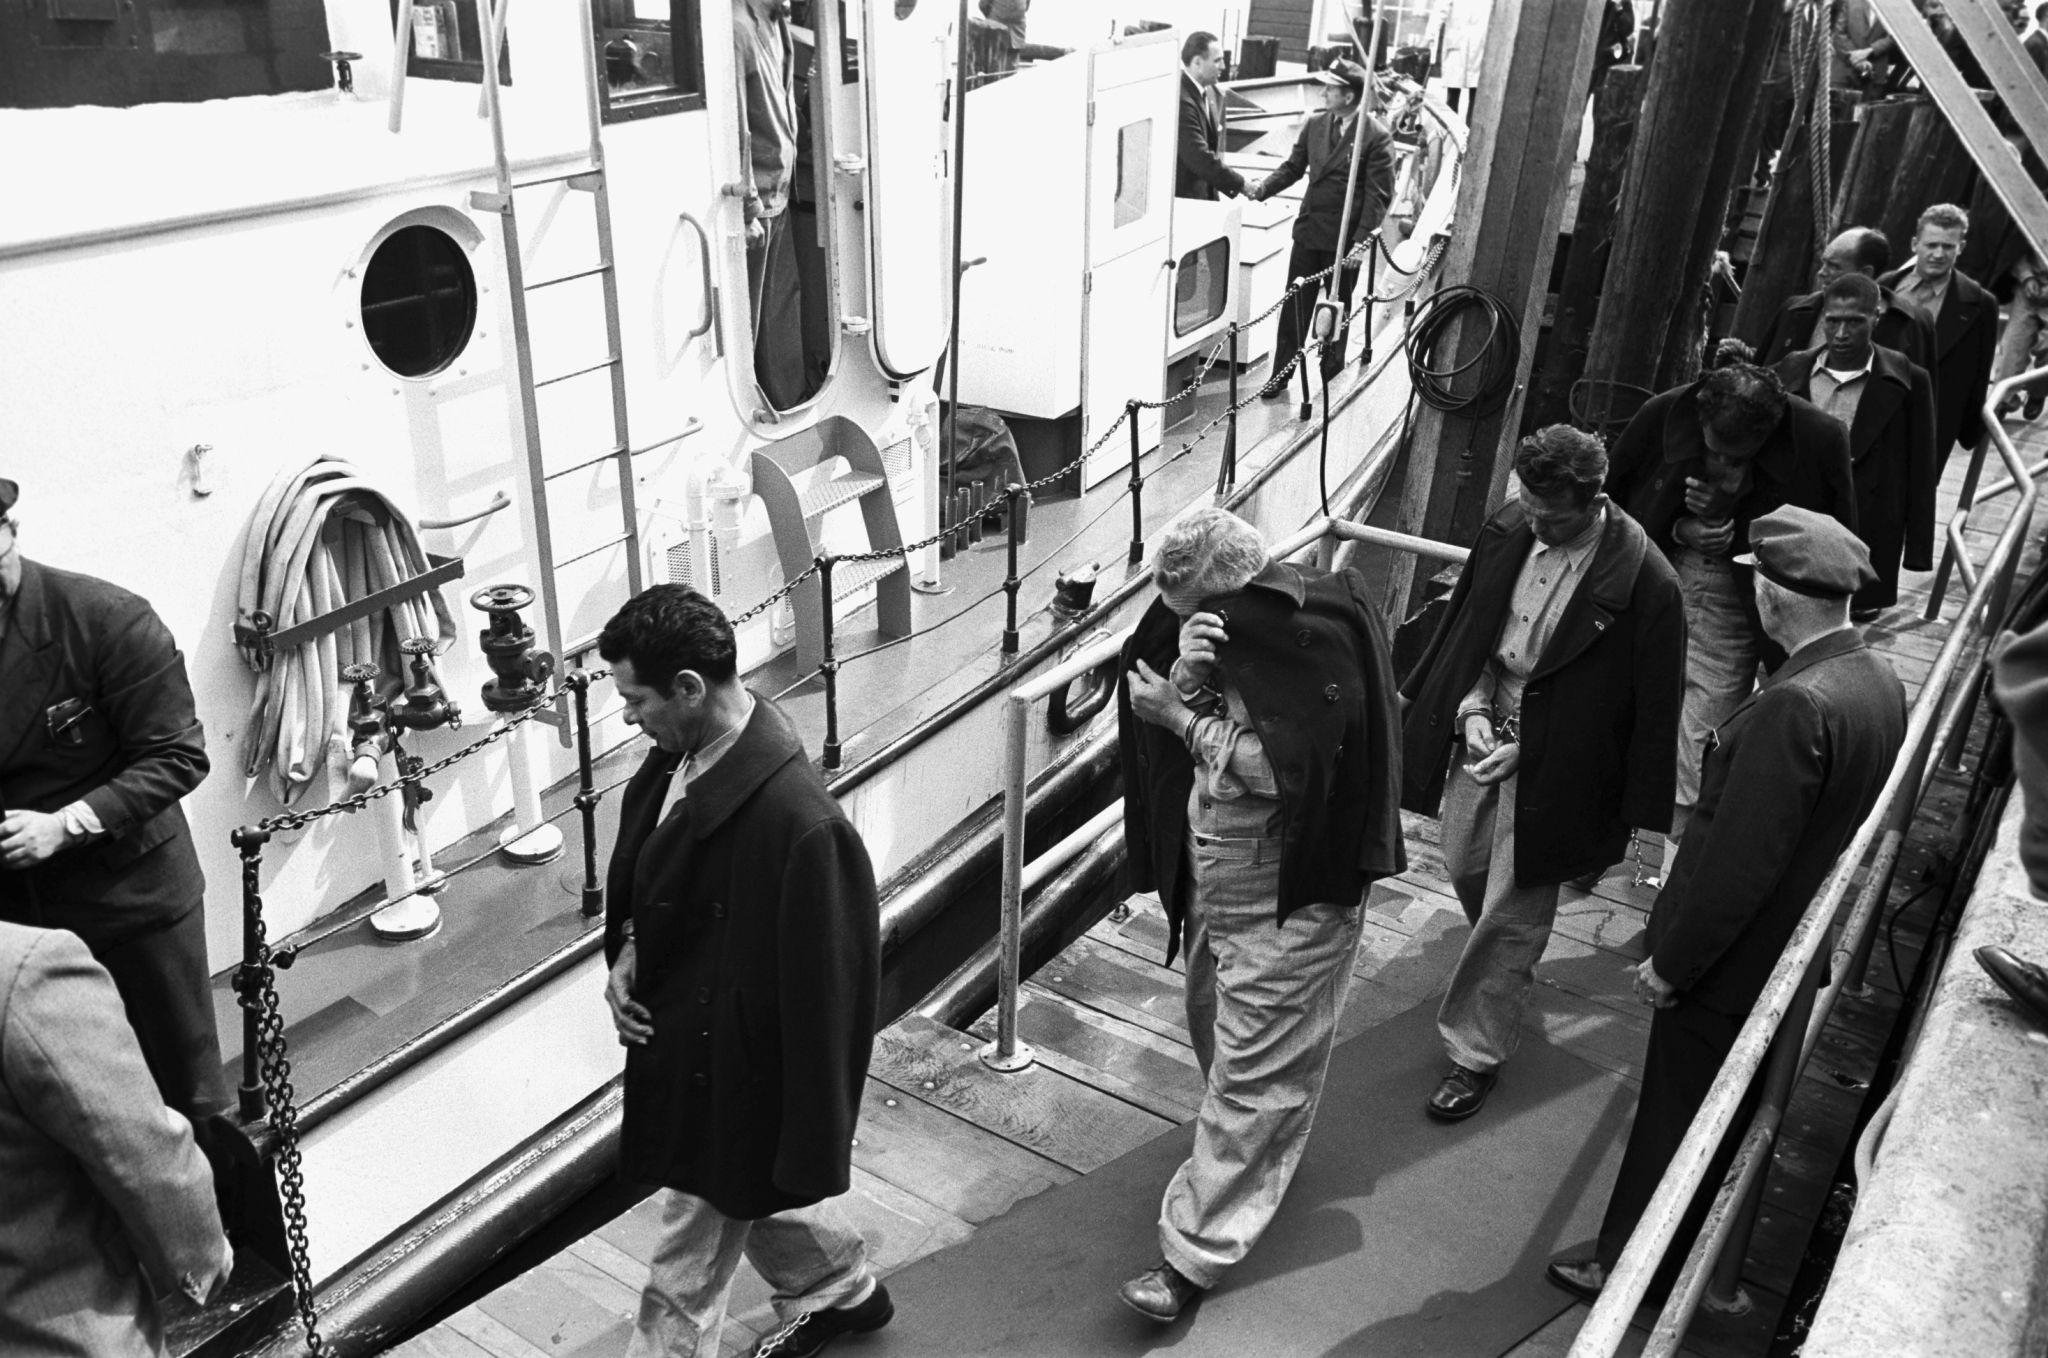 Today marks 55 years since Alcatraz's last prisoners left the island | San Francisco Gate